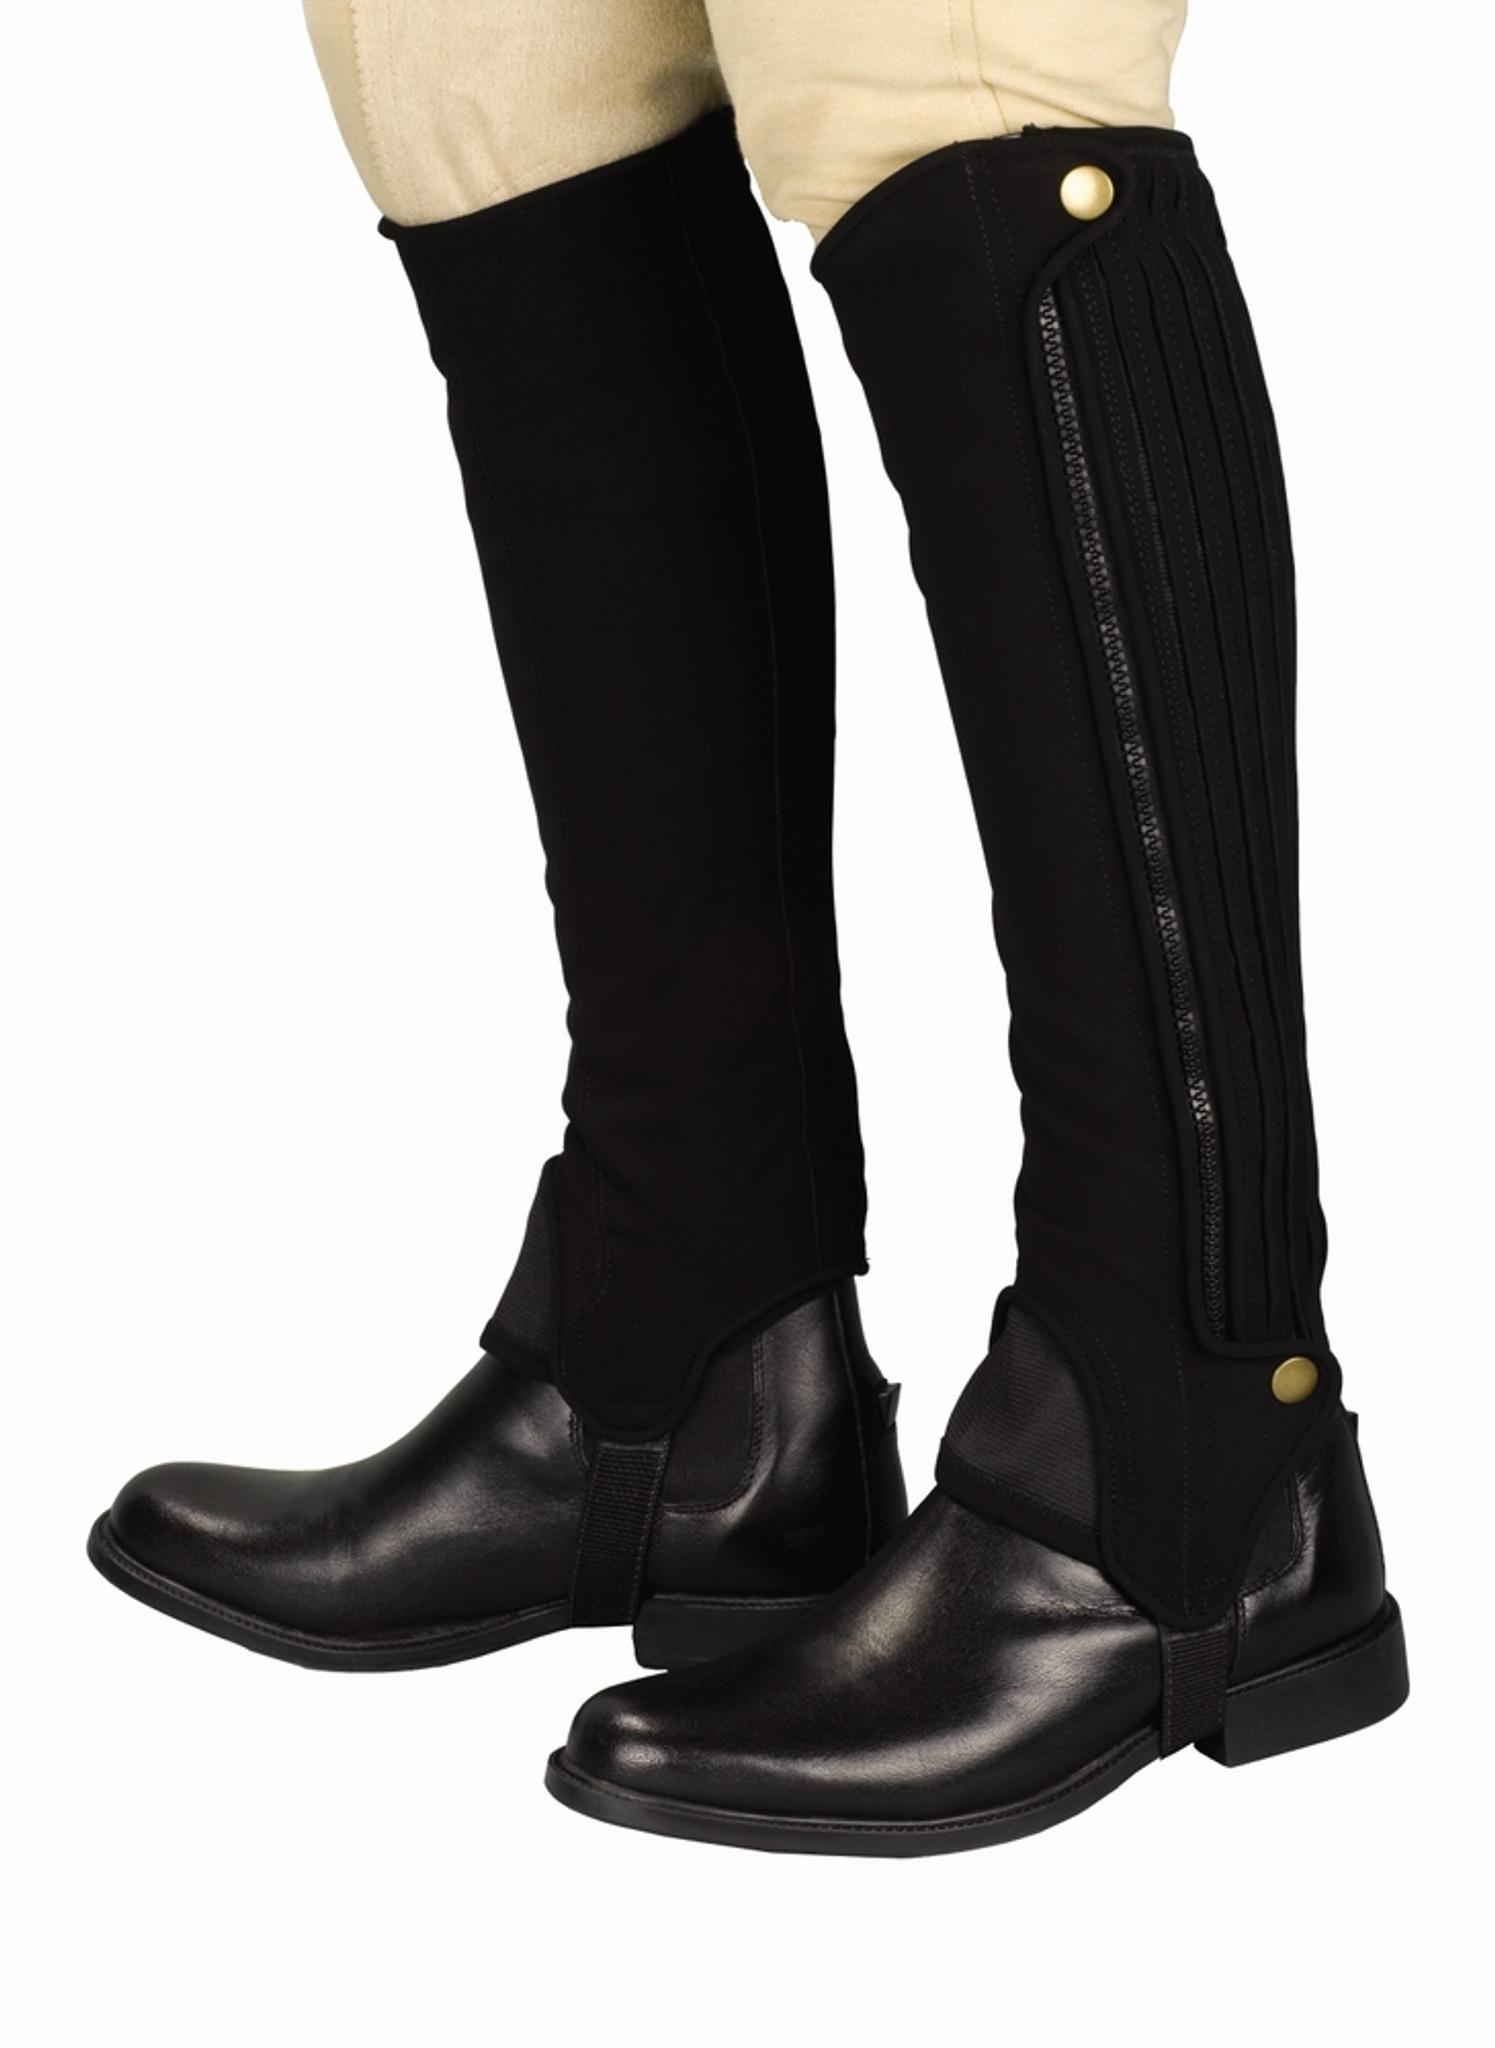 TuffRider Grippy Grain Half Chap Tall XL Brown